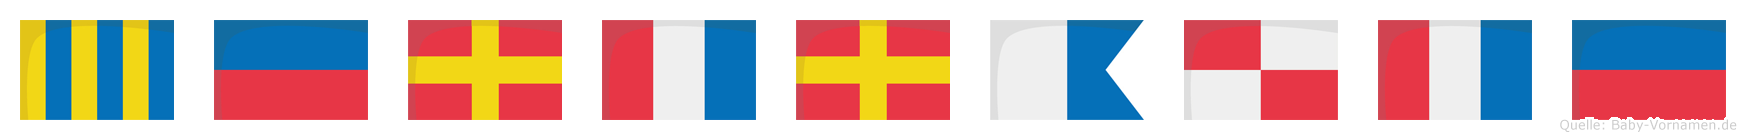 Gertraute im Flaggenalphabet